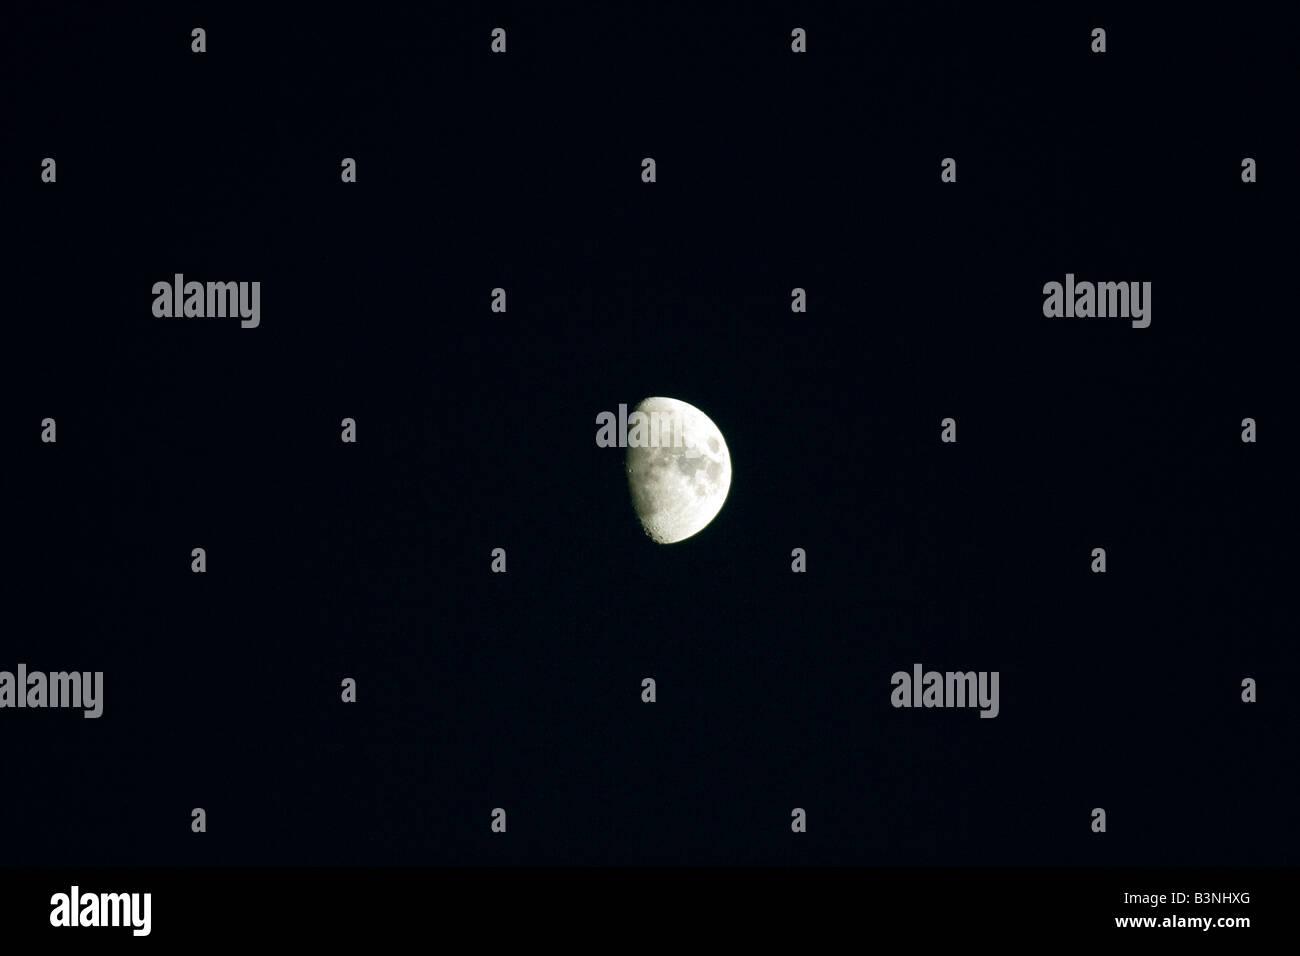 Half Moon seen from Earth - Stock Image